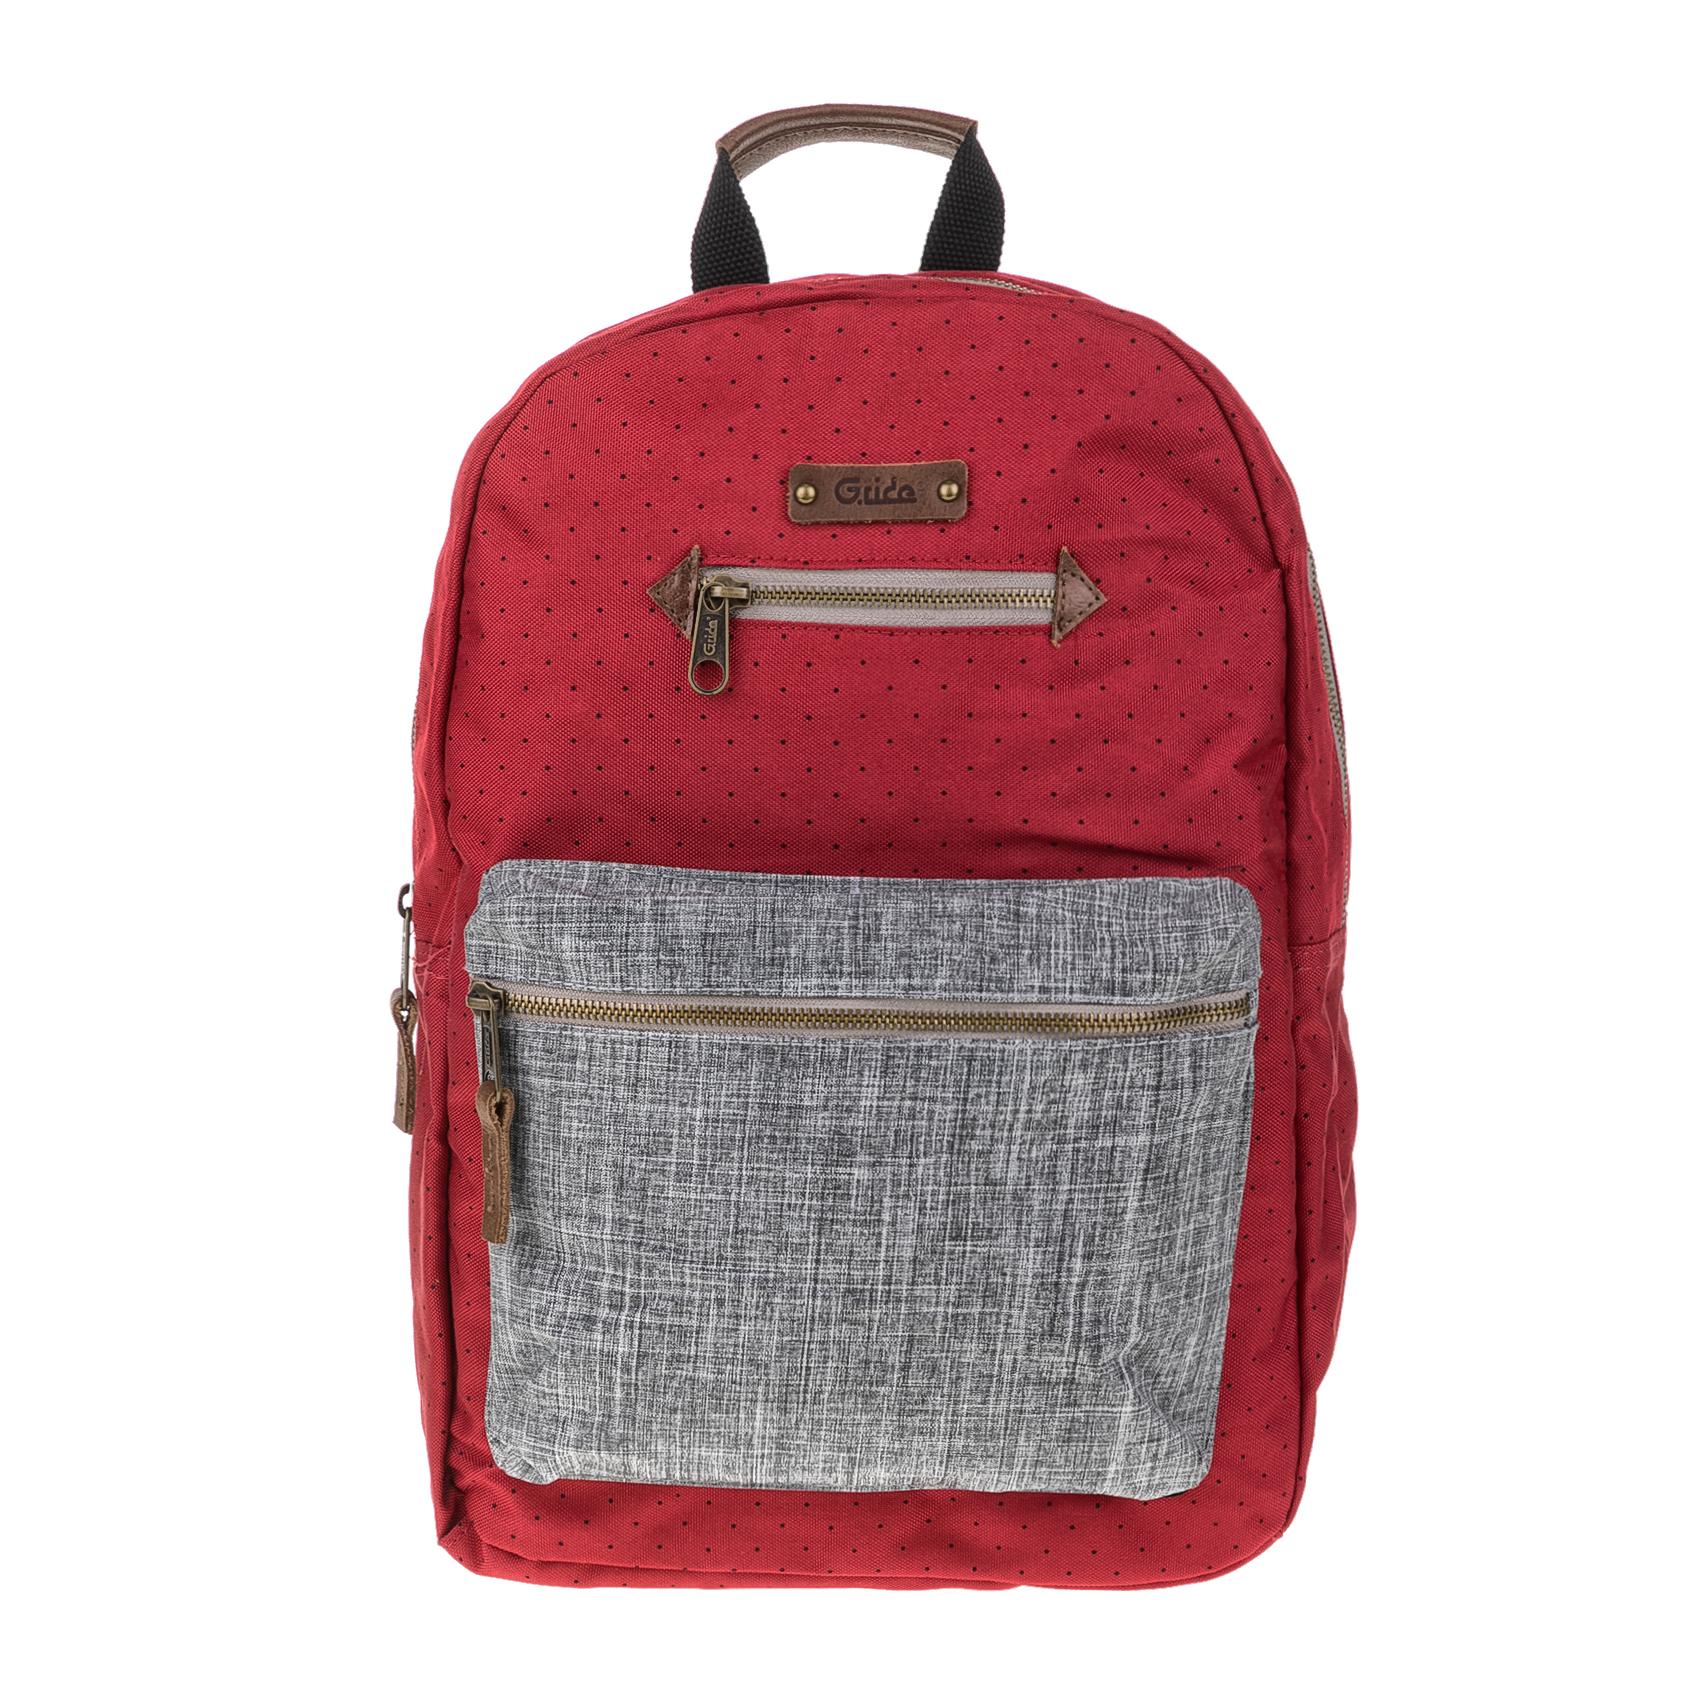 G.RIDE – Τσάντα πλάτης BLANCHE BACKPACK κόκκινη 1516518.0-45G6